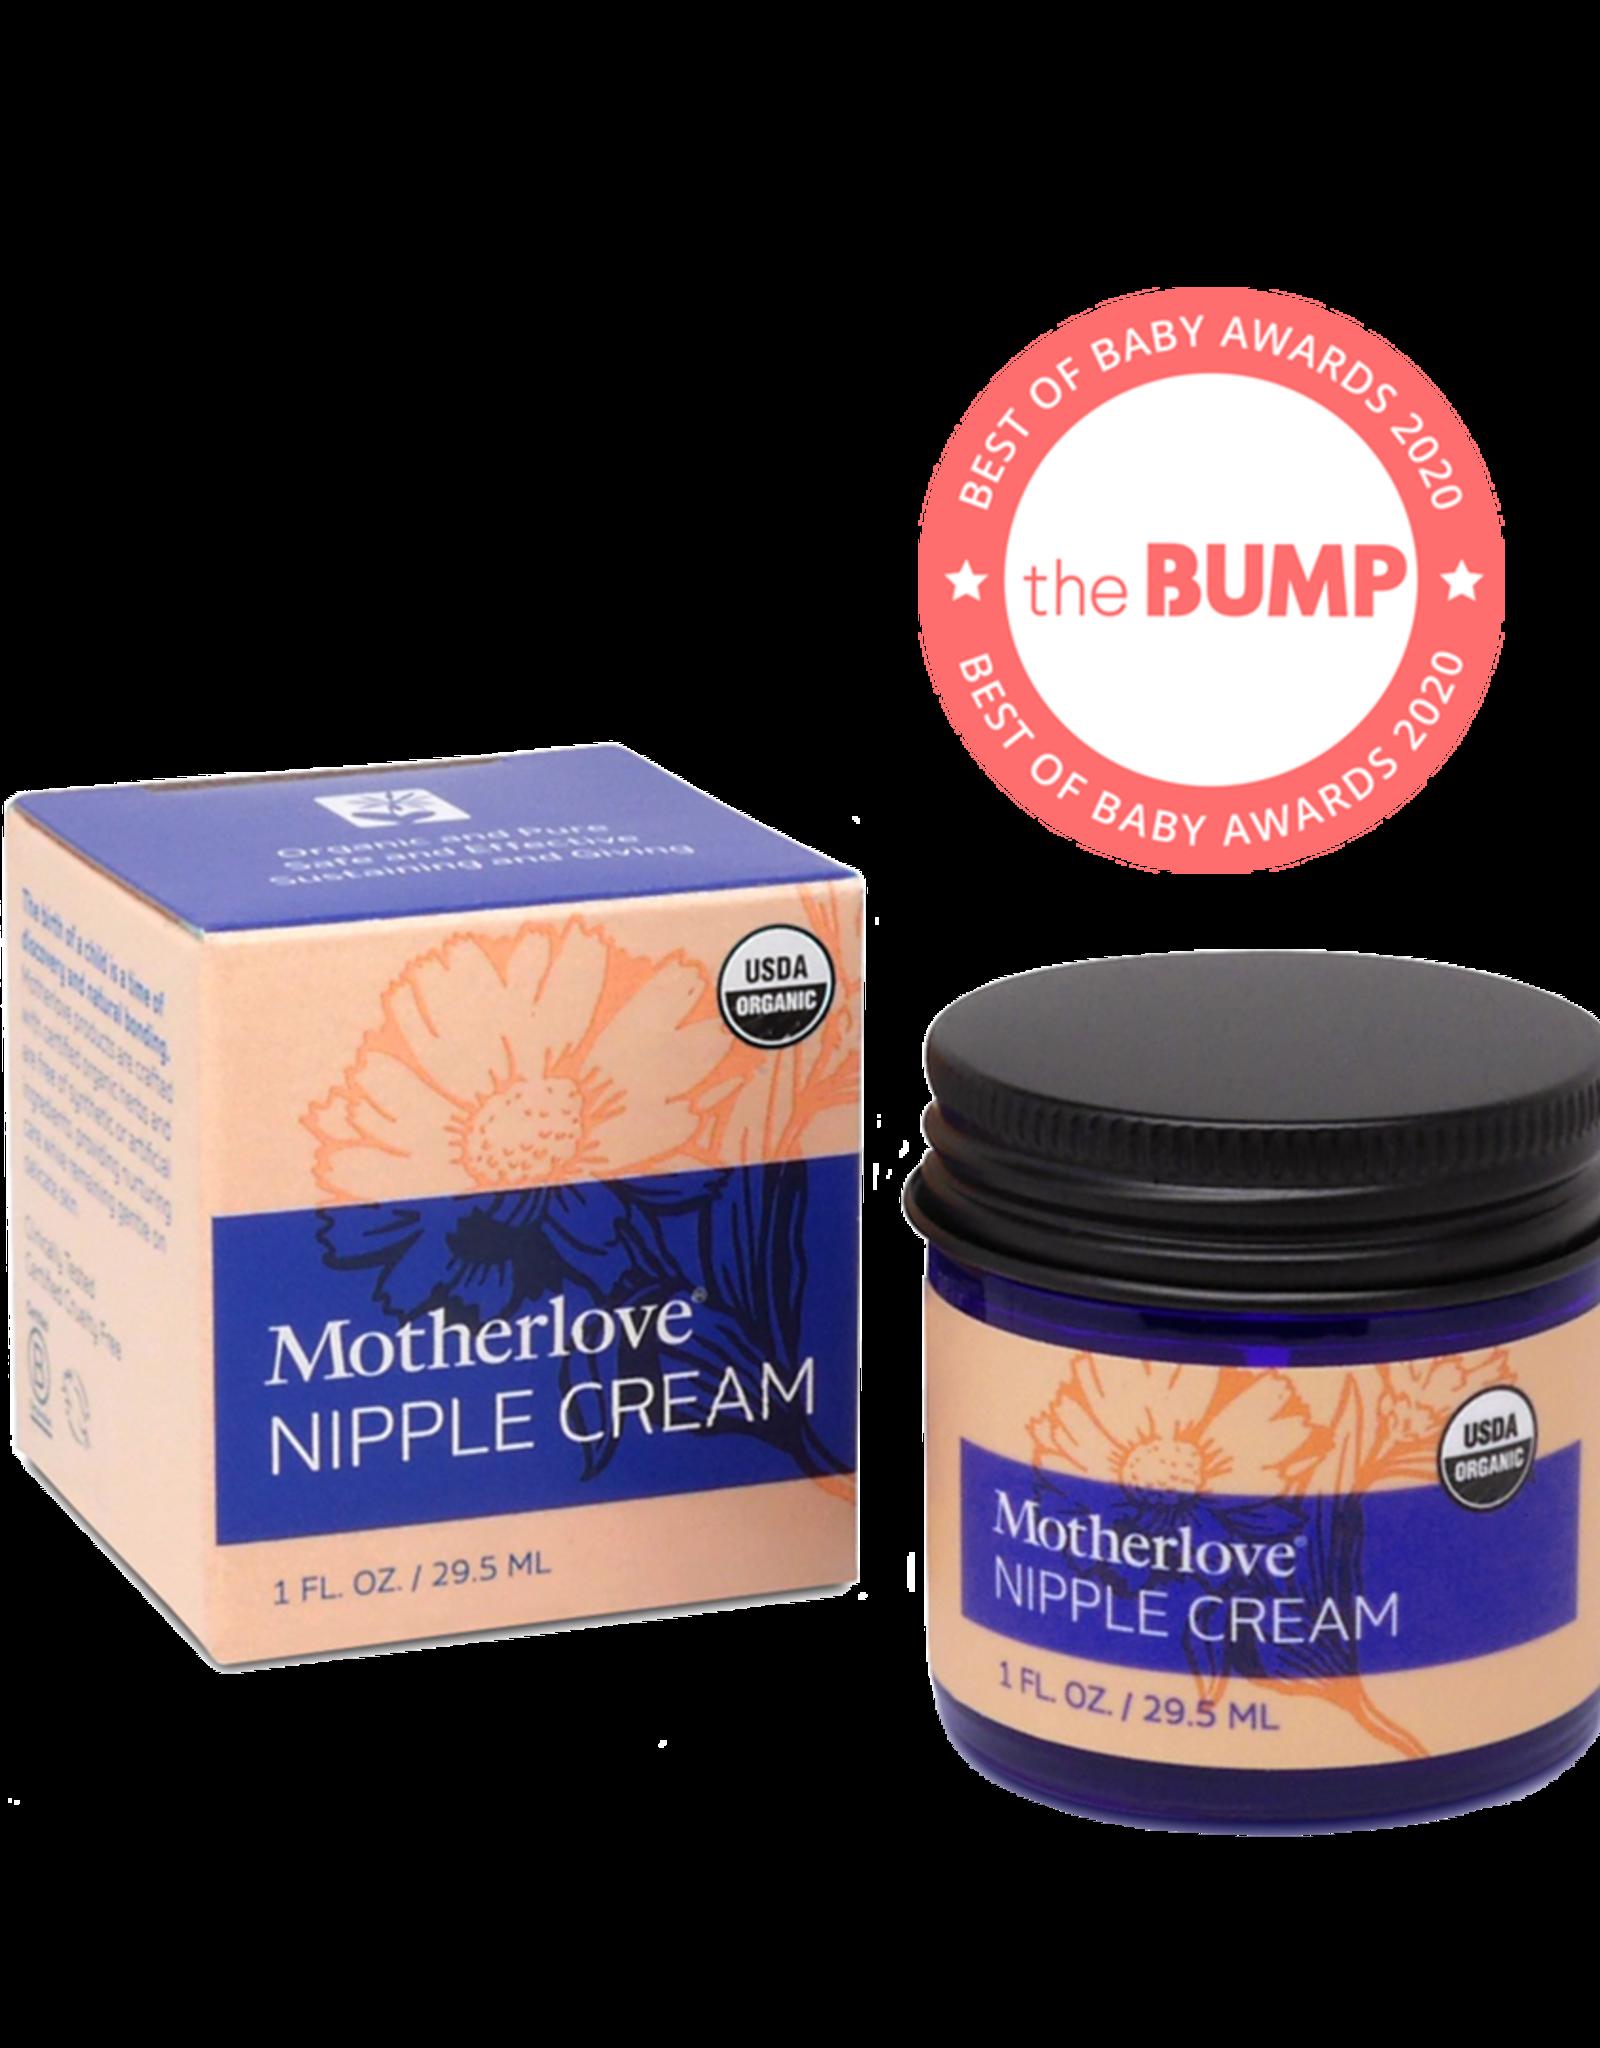 Motherlove Nipple Cream 1 oz.